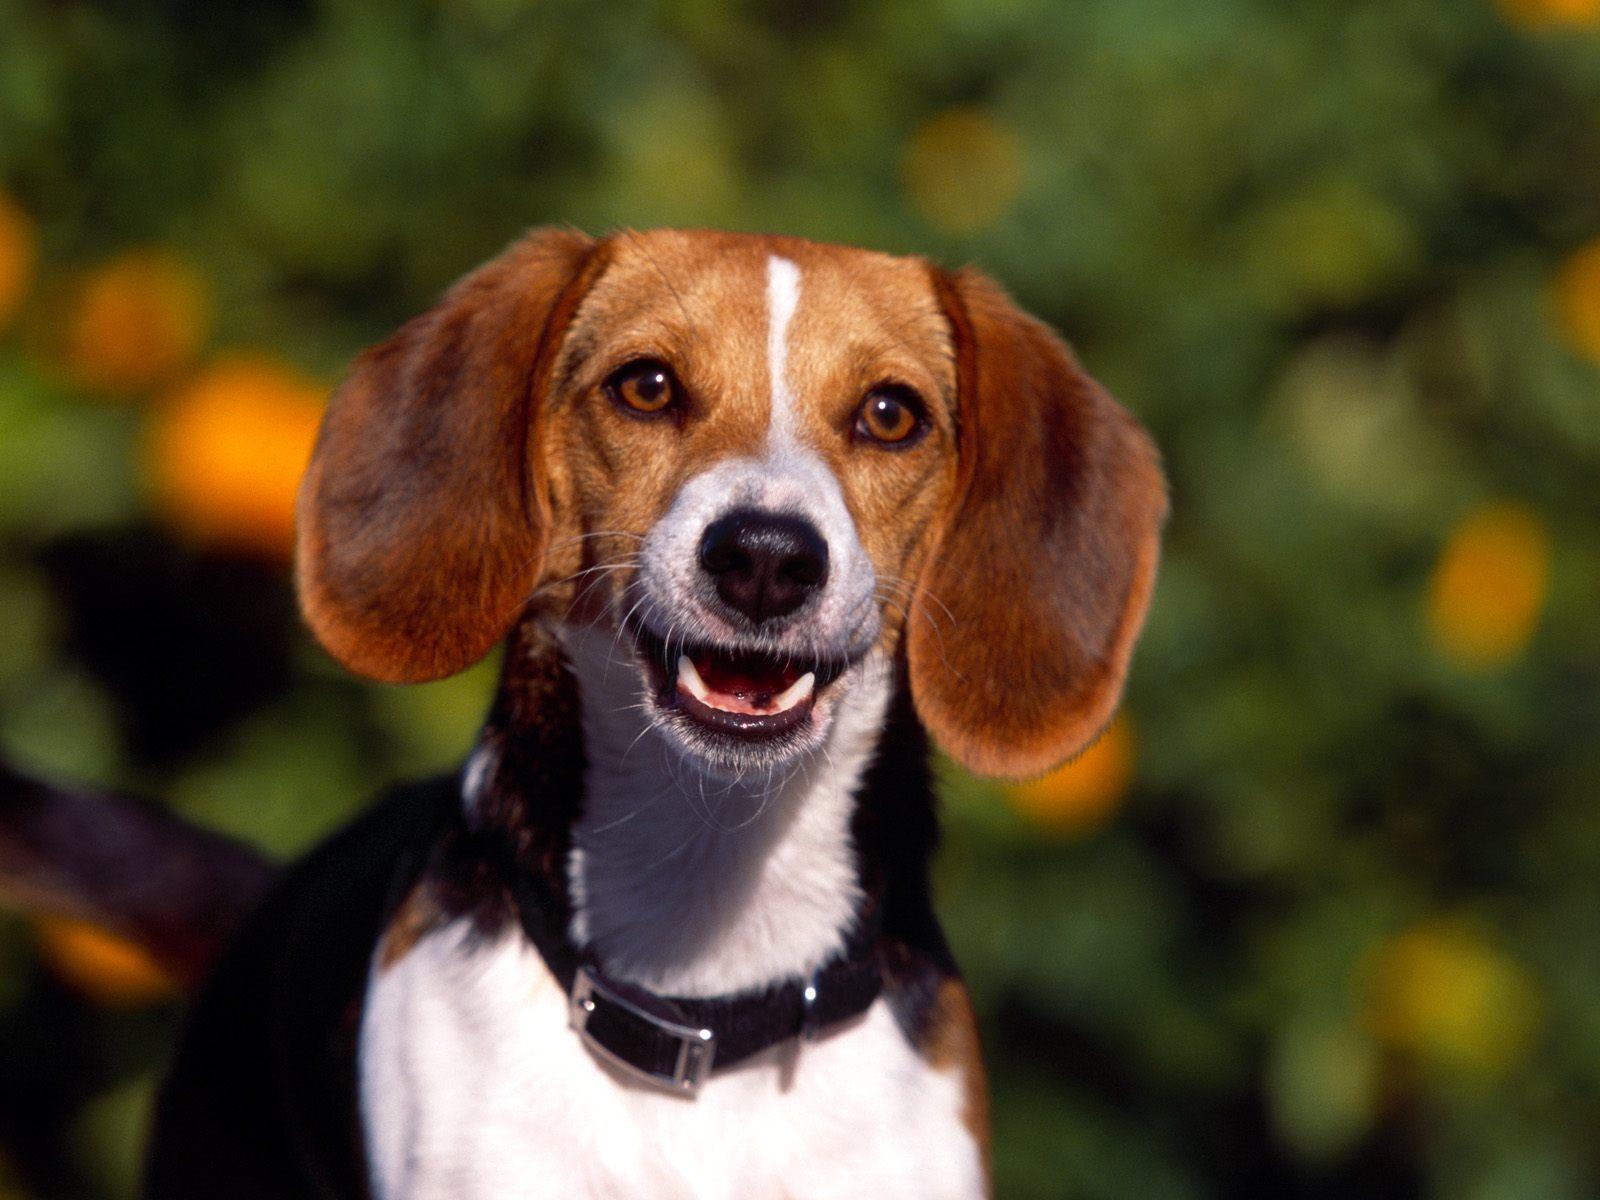 Beagle - beagles Wallpaper